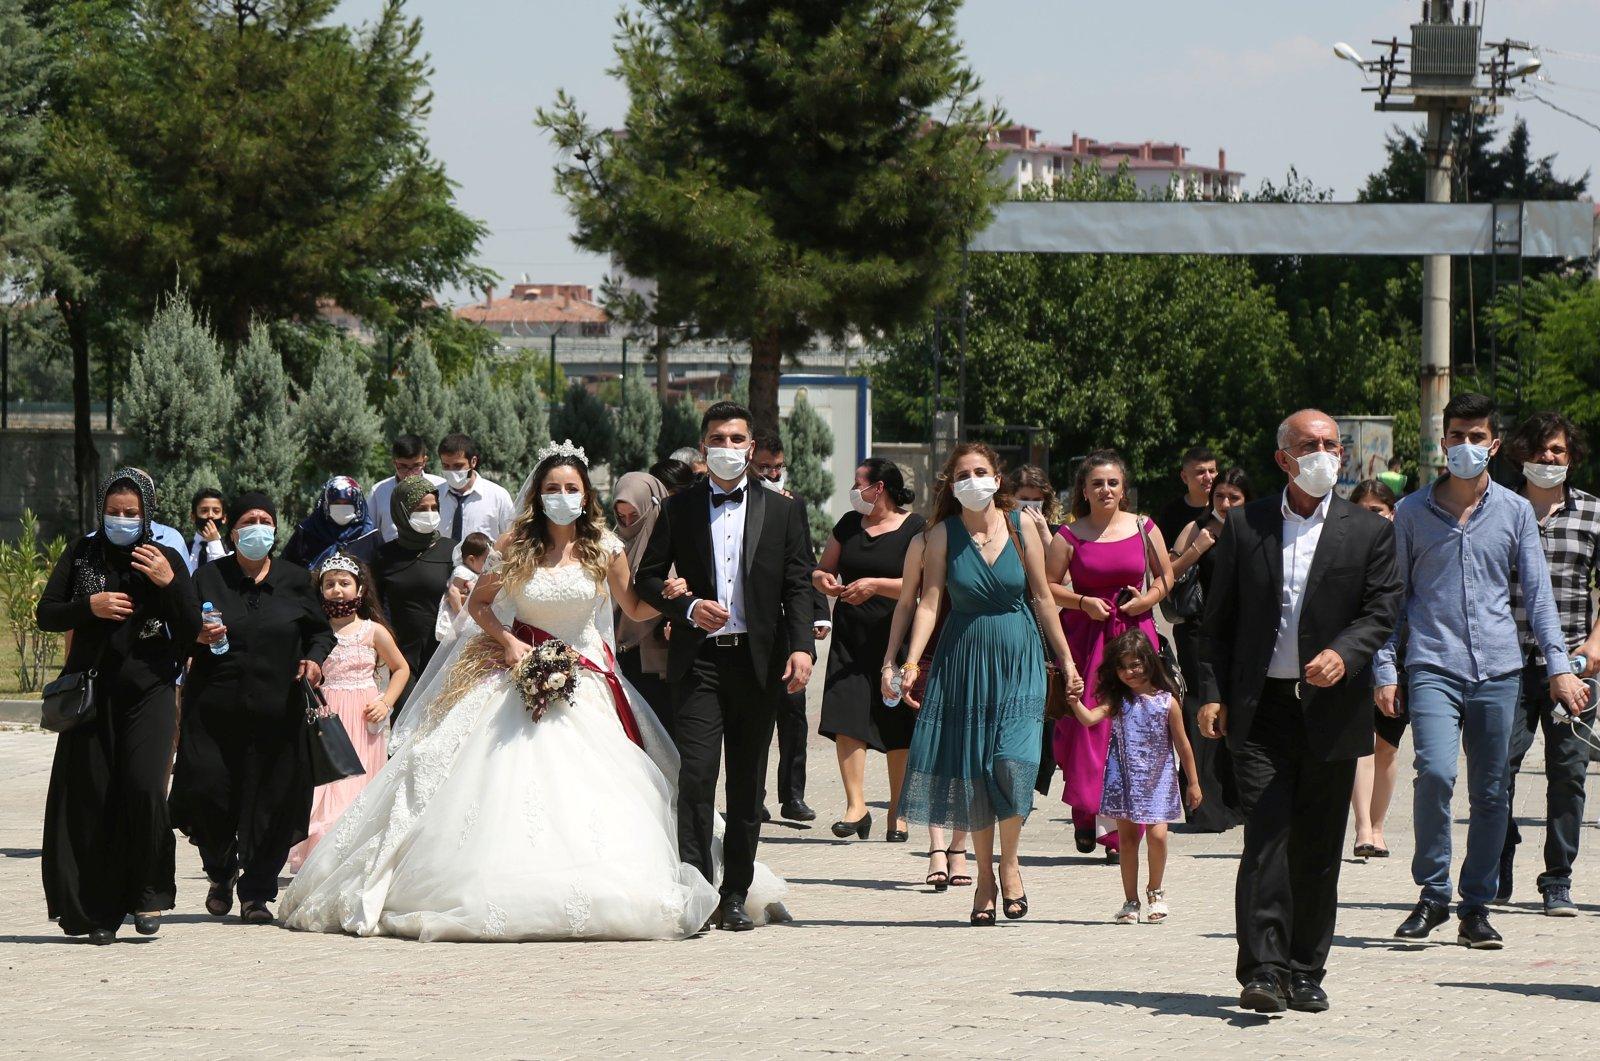 Bride Pelsin Akkoyun and groom Nizamettin Bingol, wearing protective face masks, walk with their relatives and friends following a civil wedding ceremony, amid the spread of the coronavirus disease (COVID-19), in Diyarbakir, Turkey, July 2, 2020. (Reuters Photo)